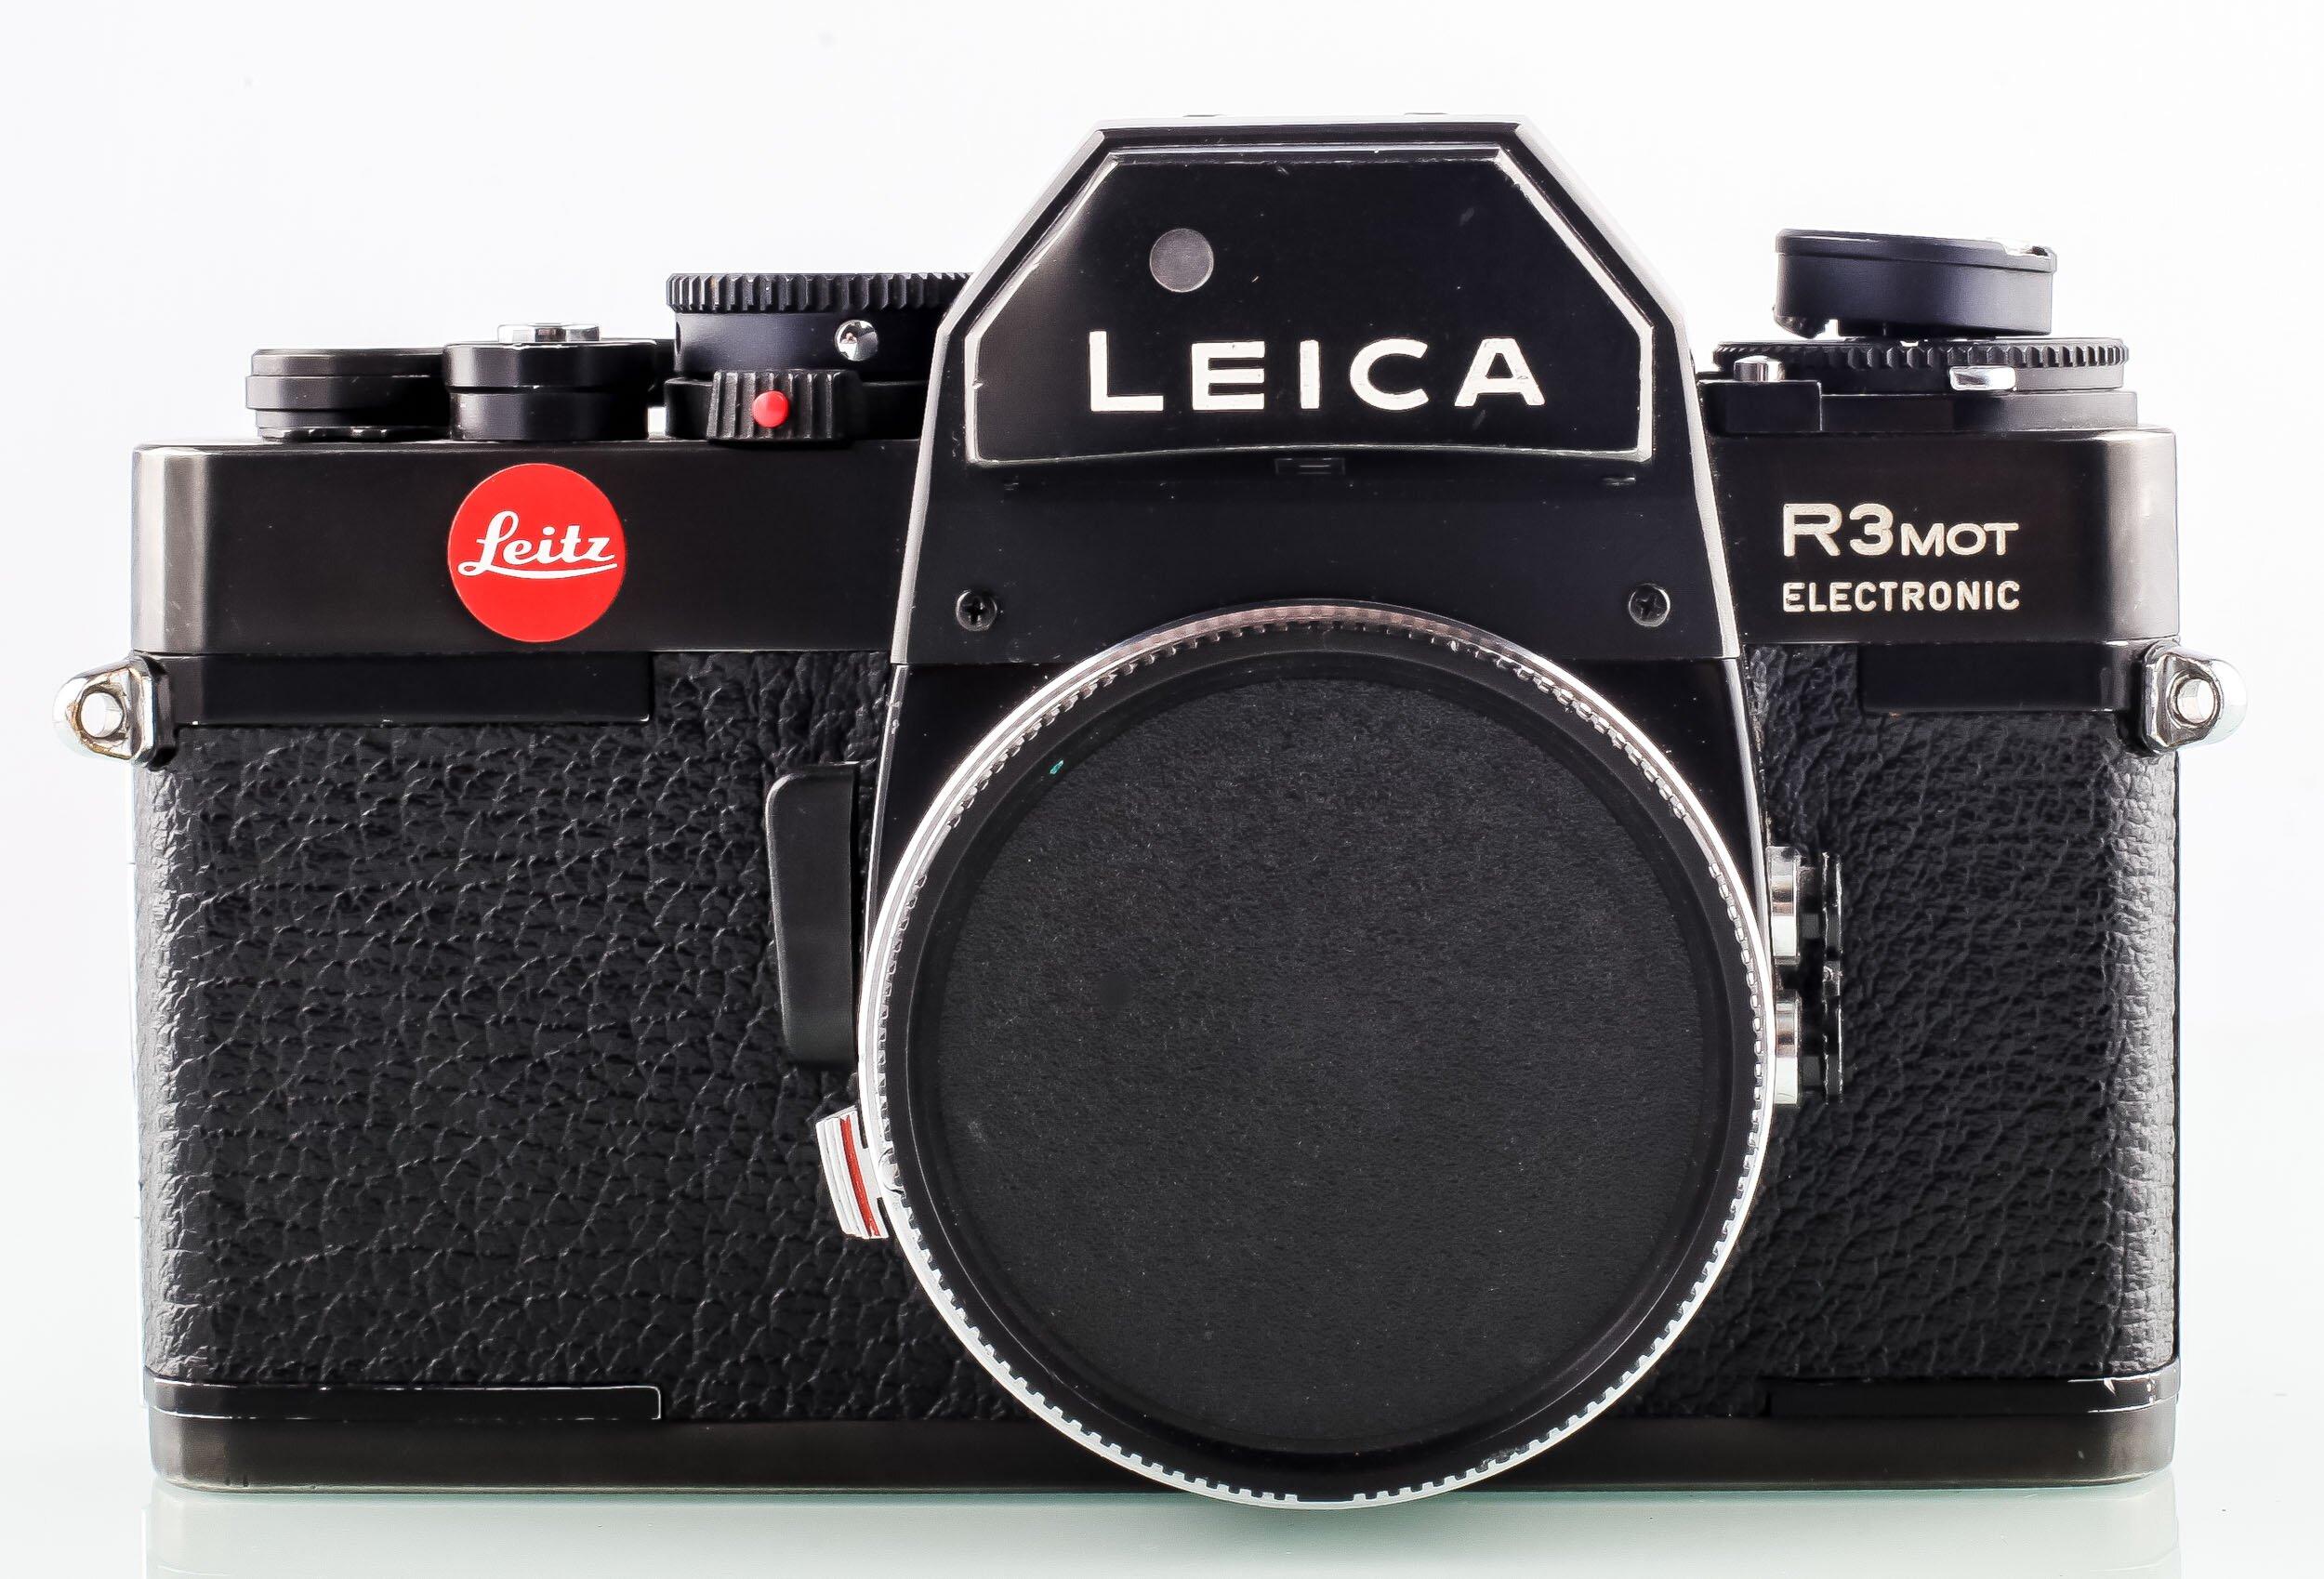 Leica R3 Mot Electronik schwarz